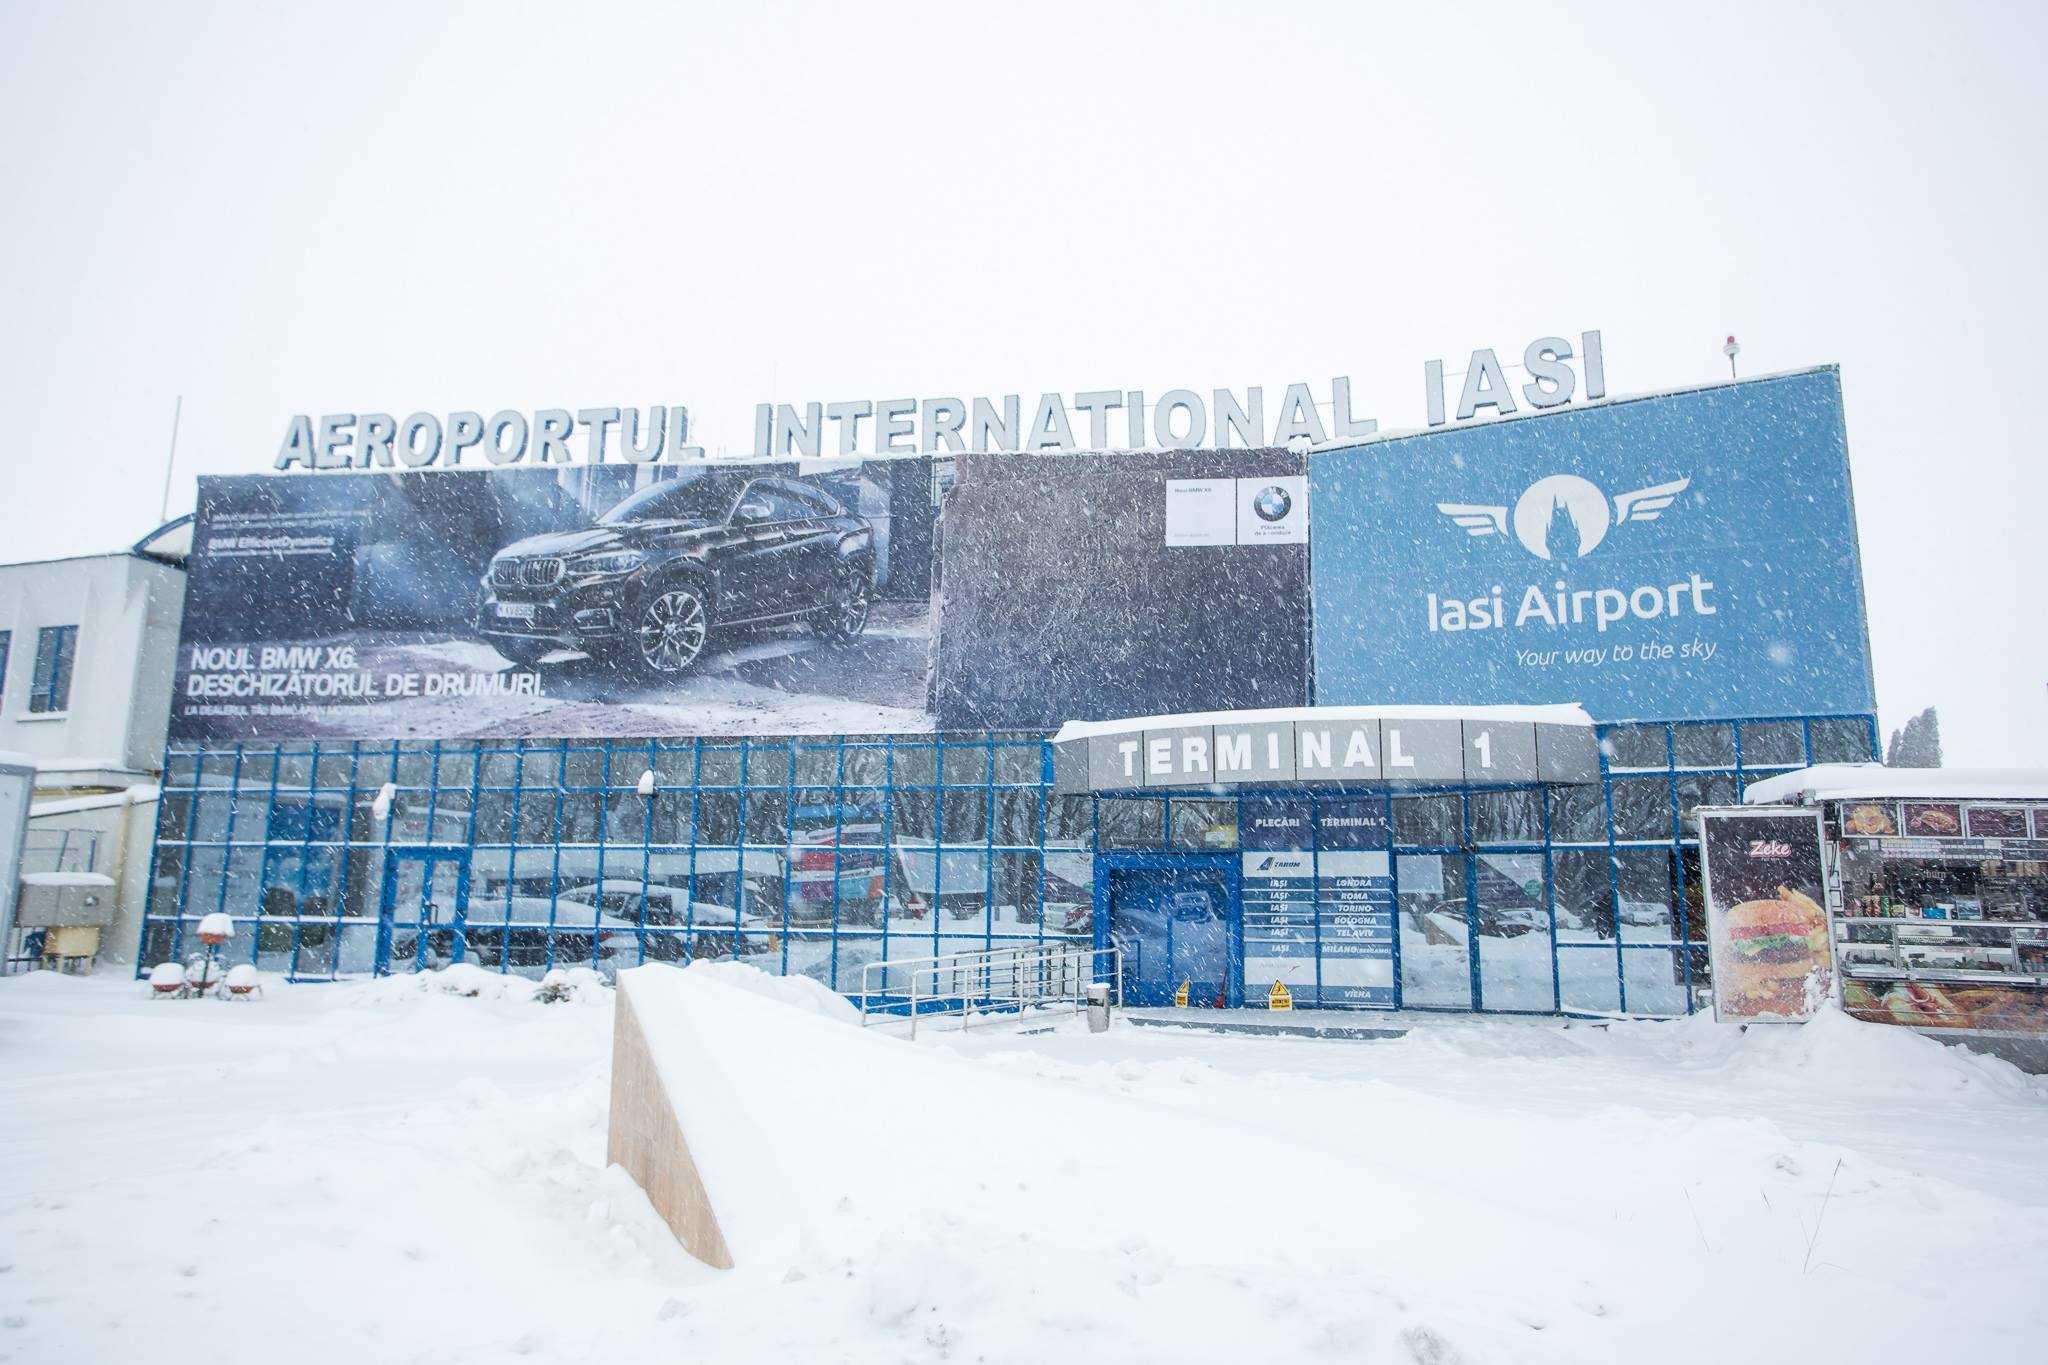 Trafic_Aerian_Aeroport_Iasi_29.12.2014_1